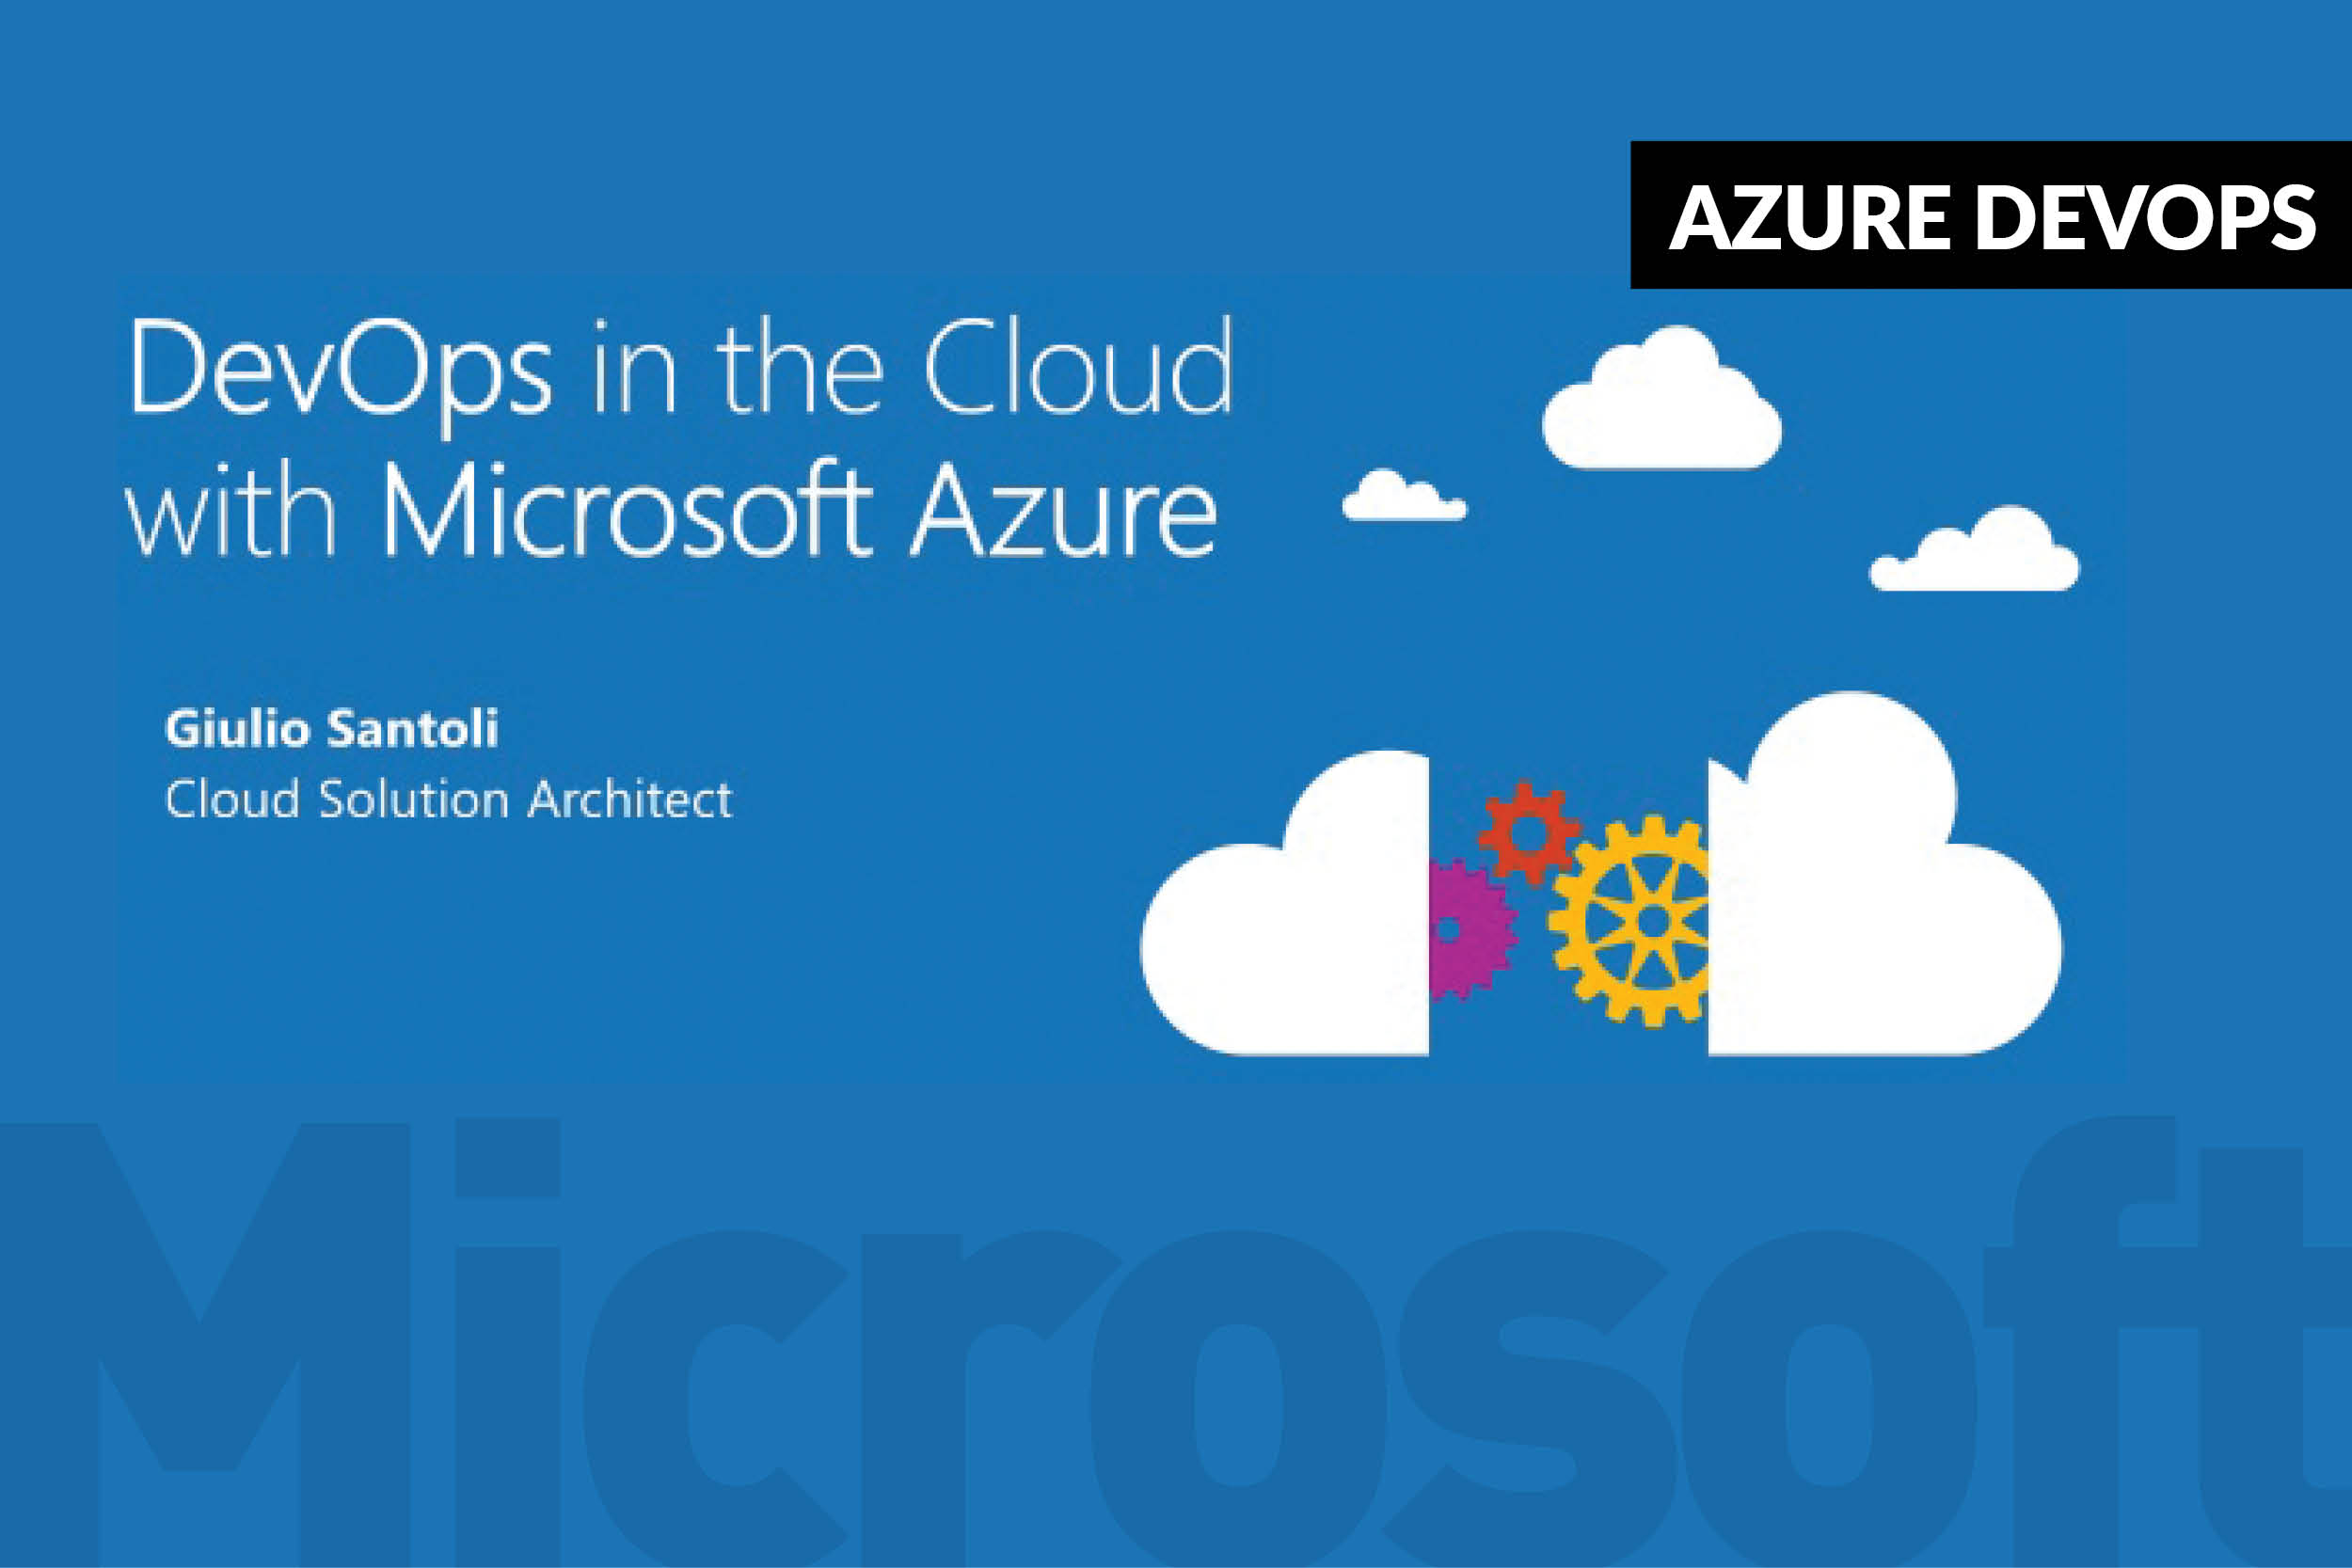 Microsoft's Azure DevOps assure developers ship software